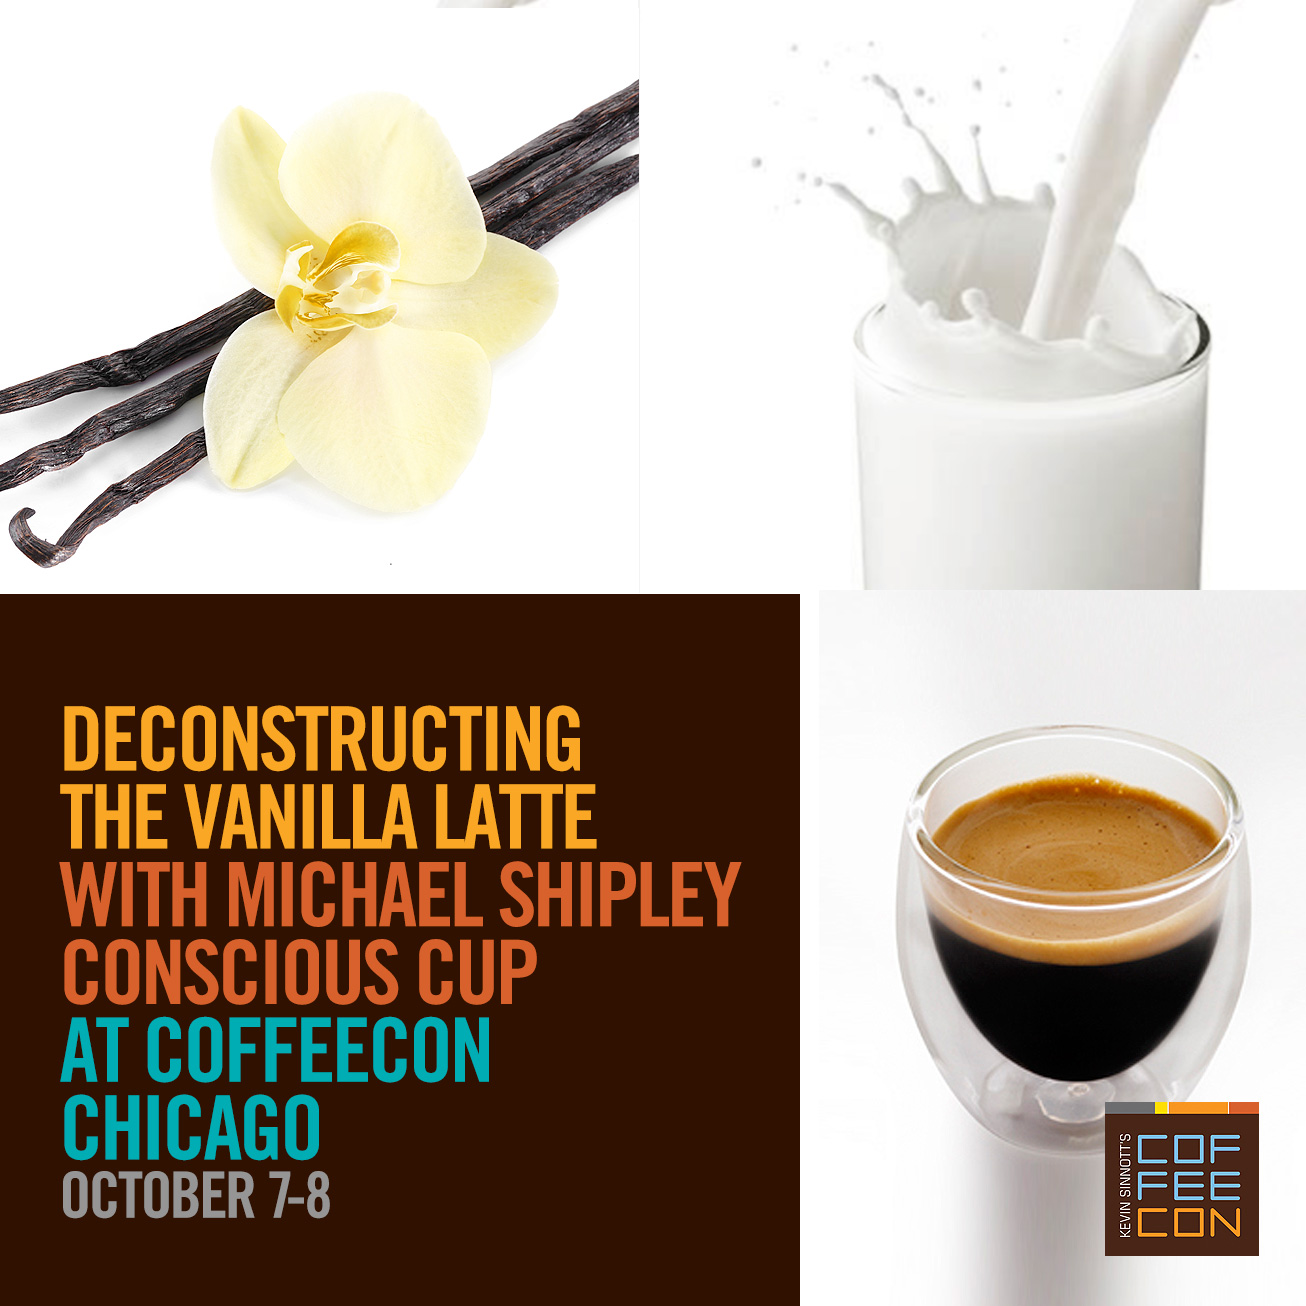 Deconstructing The Vanilla Latte at CoffeeCon Chicago 2017